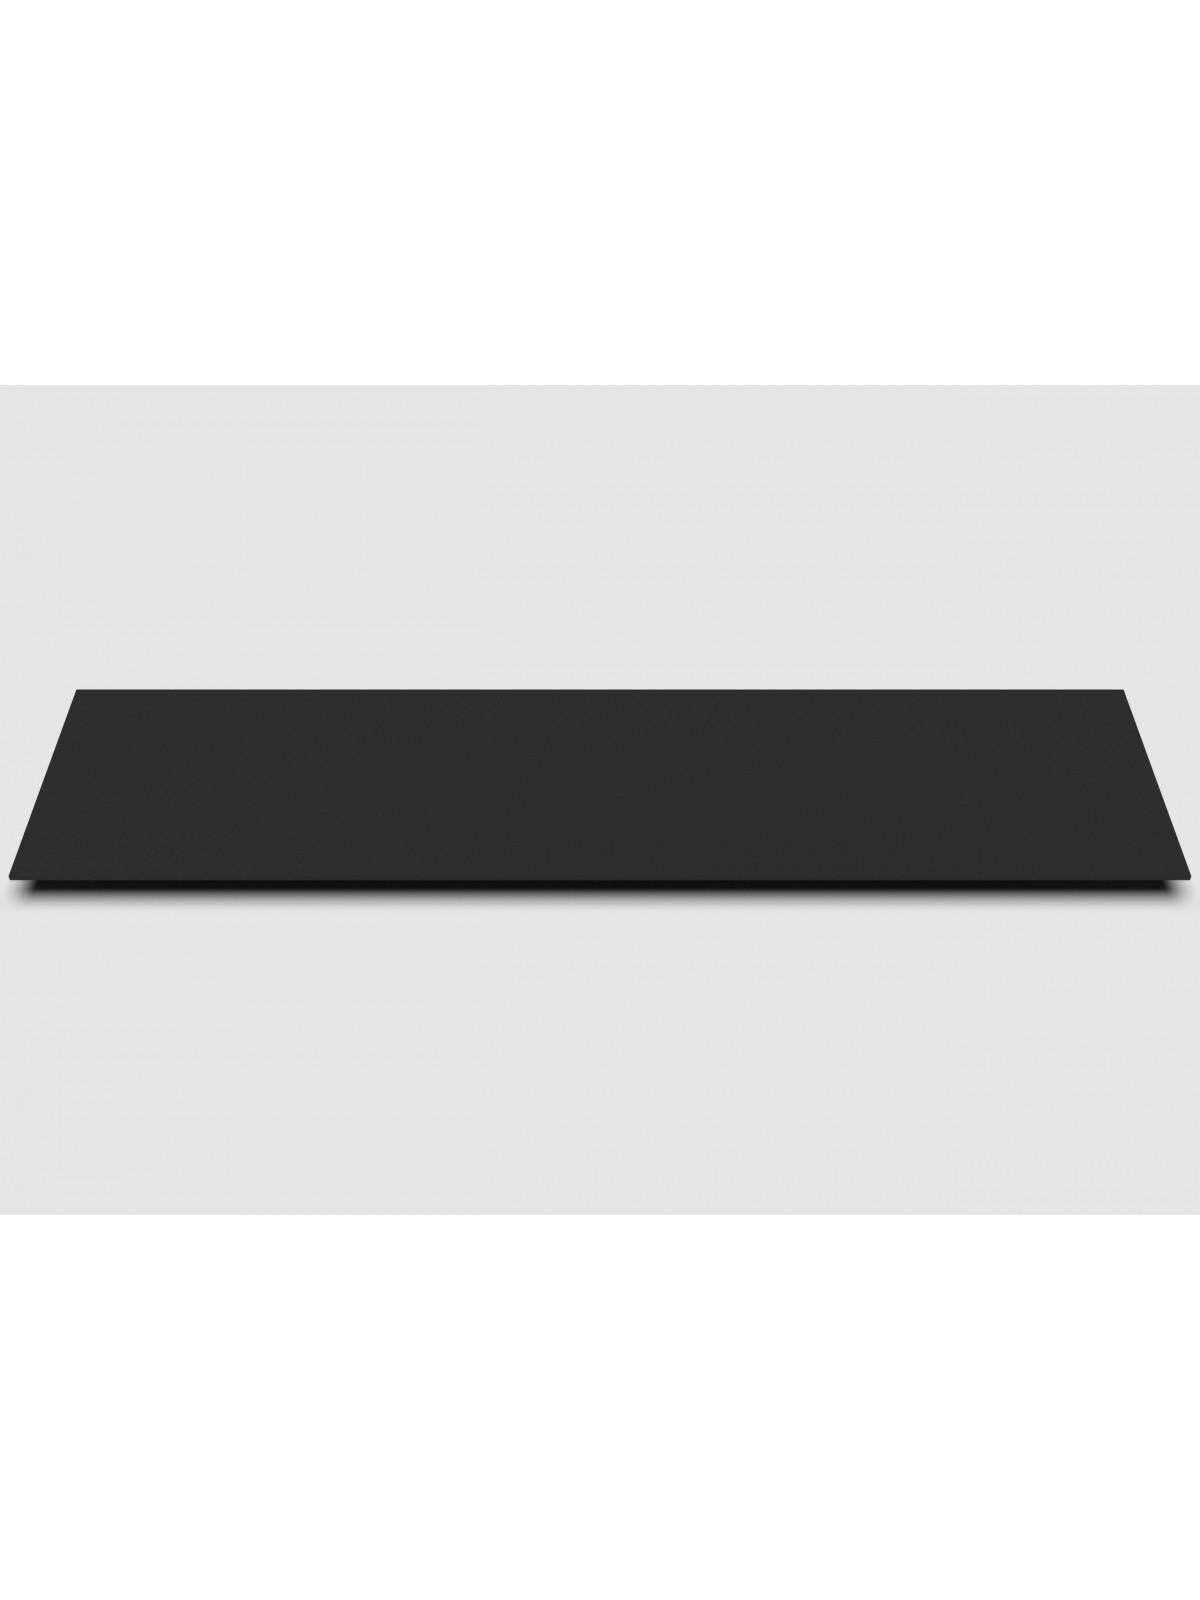 Blat kuchenny wykonany z Granitowe Premium Black